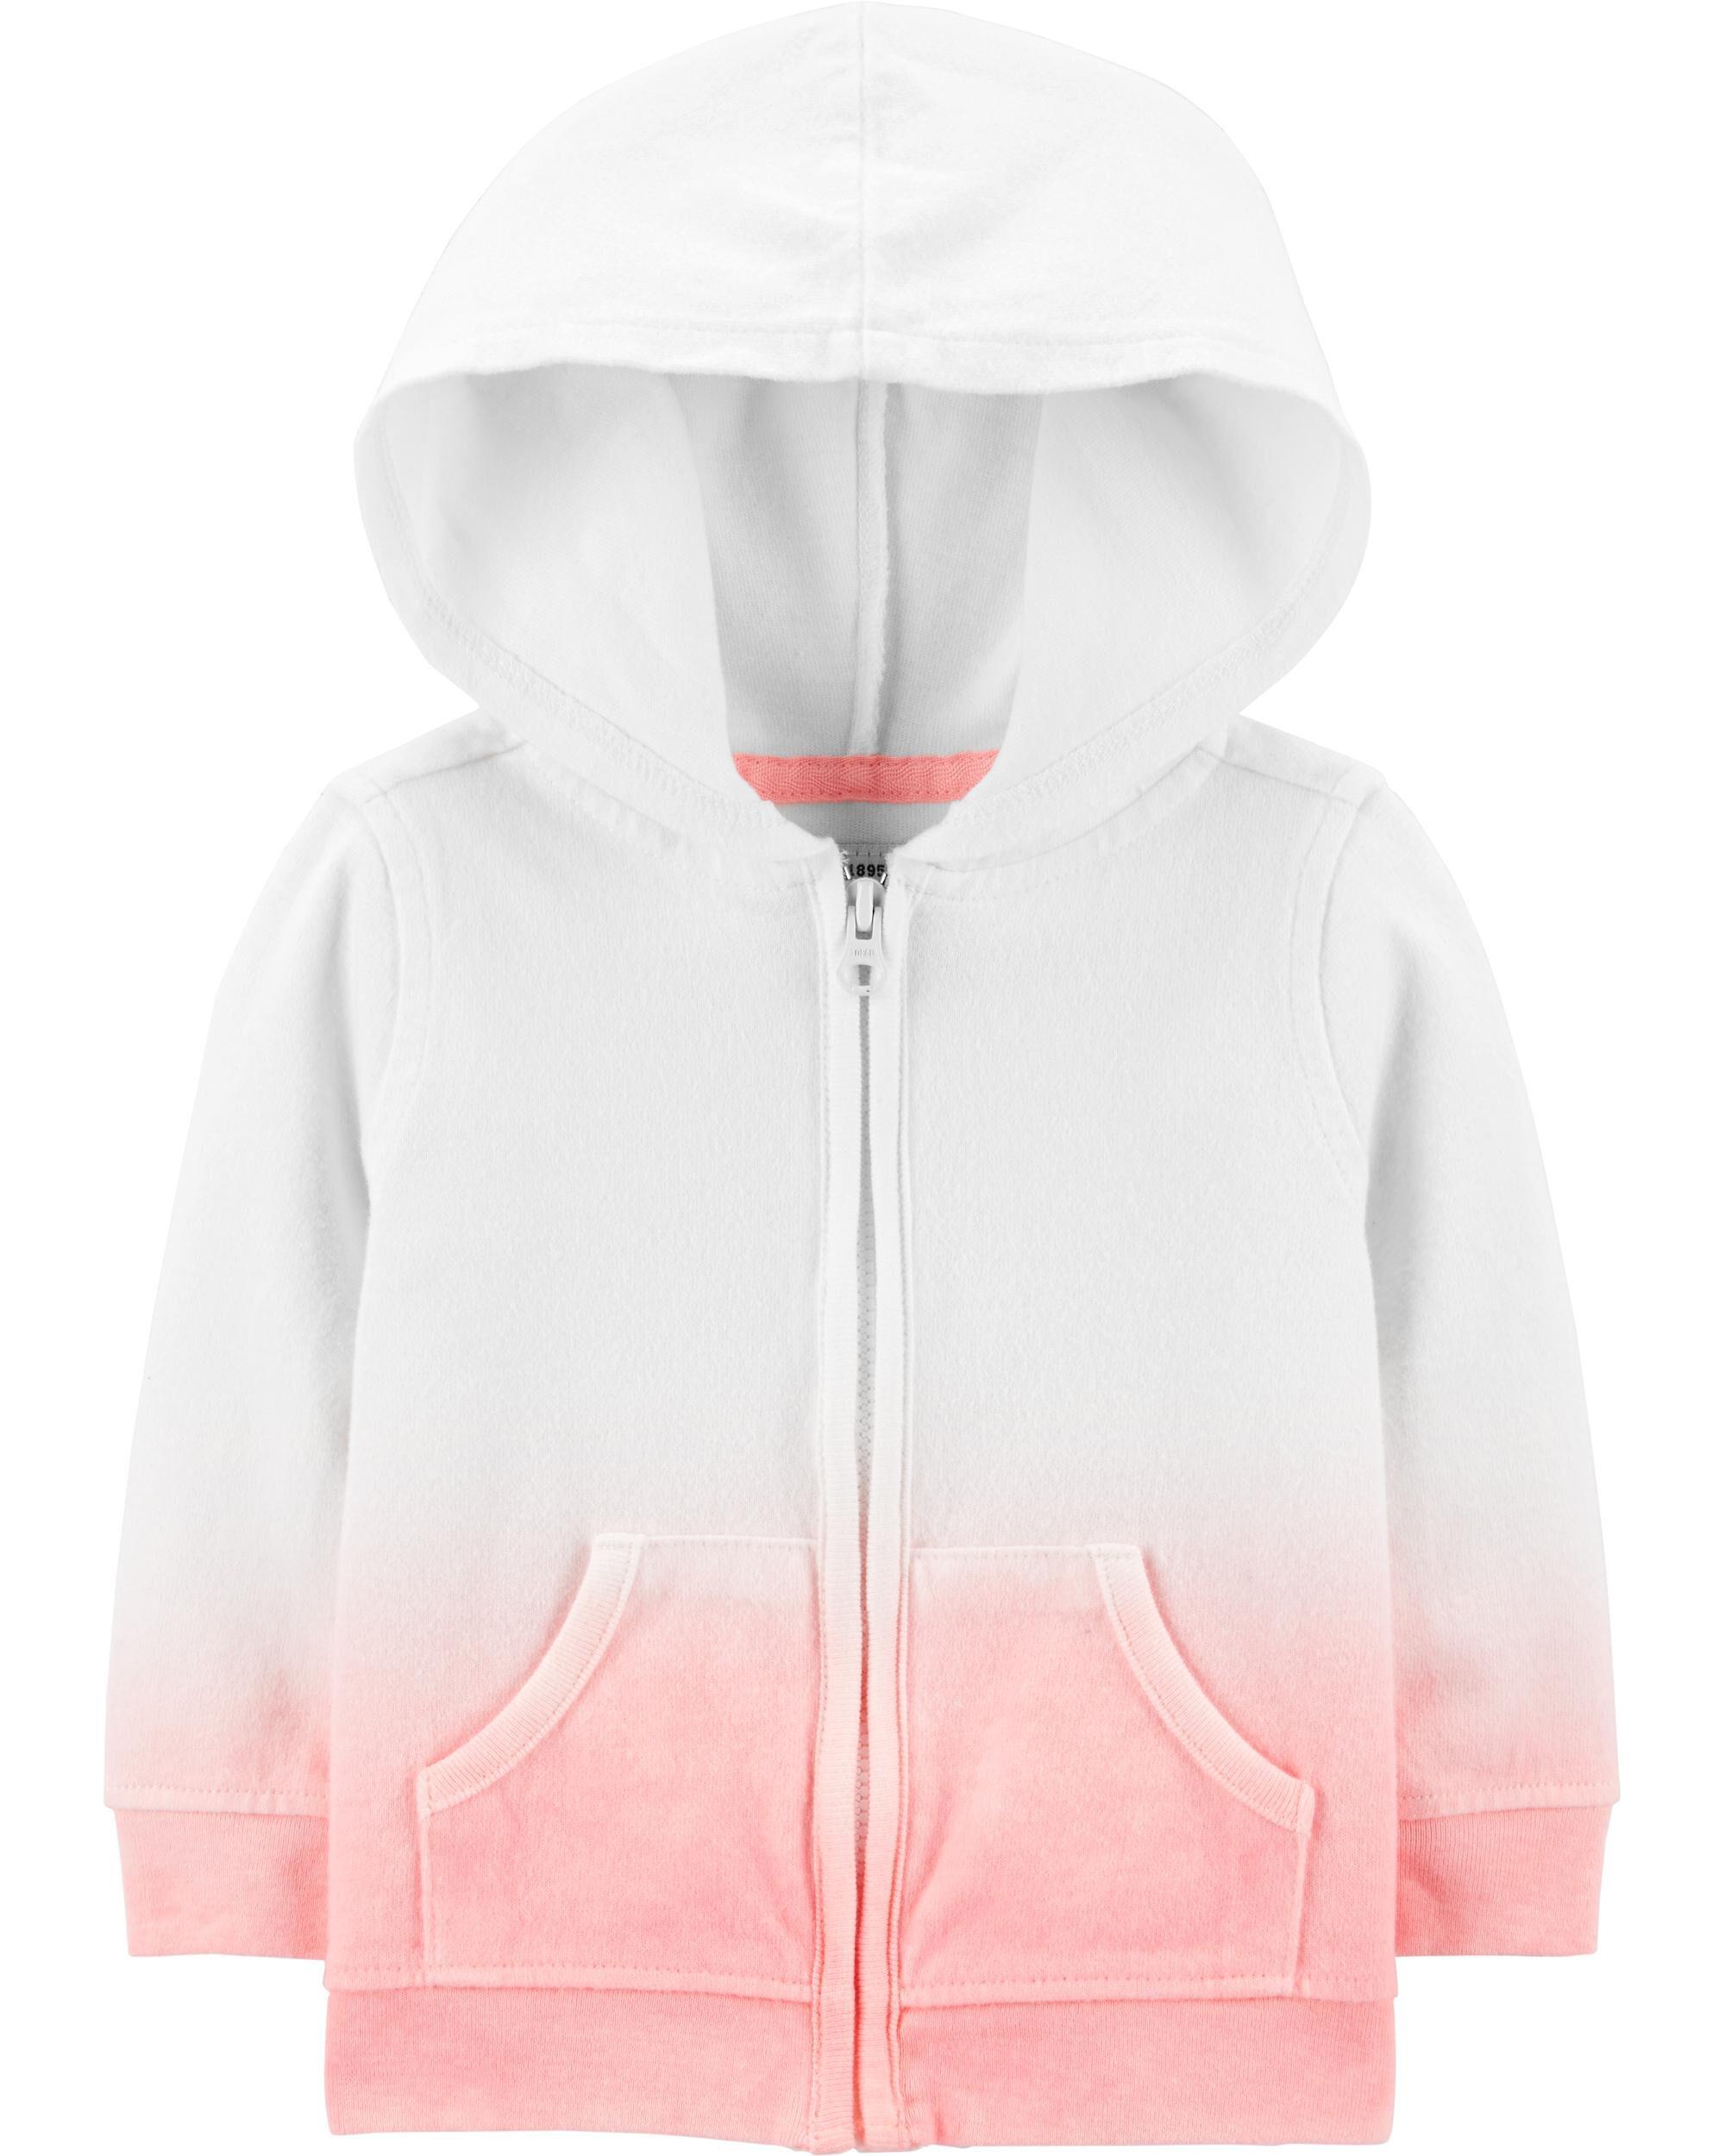 Oshkosh Genuine Kids Hooded Sweatshirt Sweater Gray Hoodie Size 12m New Clothing, Shoes & Accessories